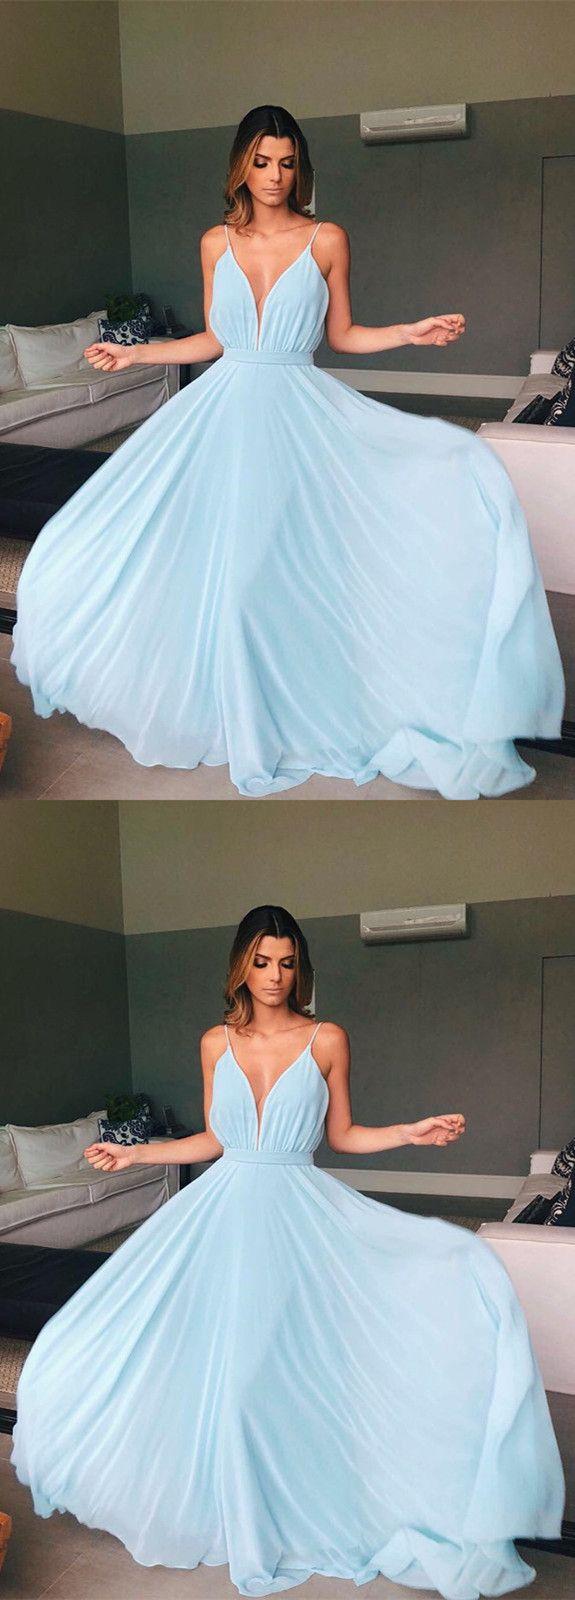 Light Blue Chiffon Bridesmaid Dresses Long V-neck Formal Prom Dresses Open Back